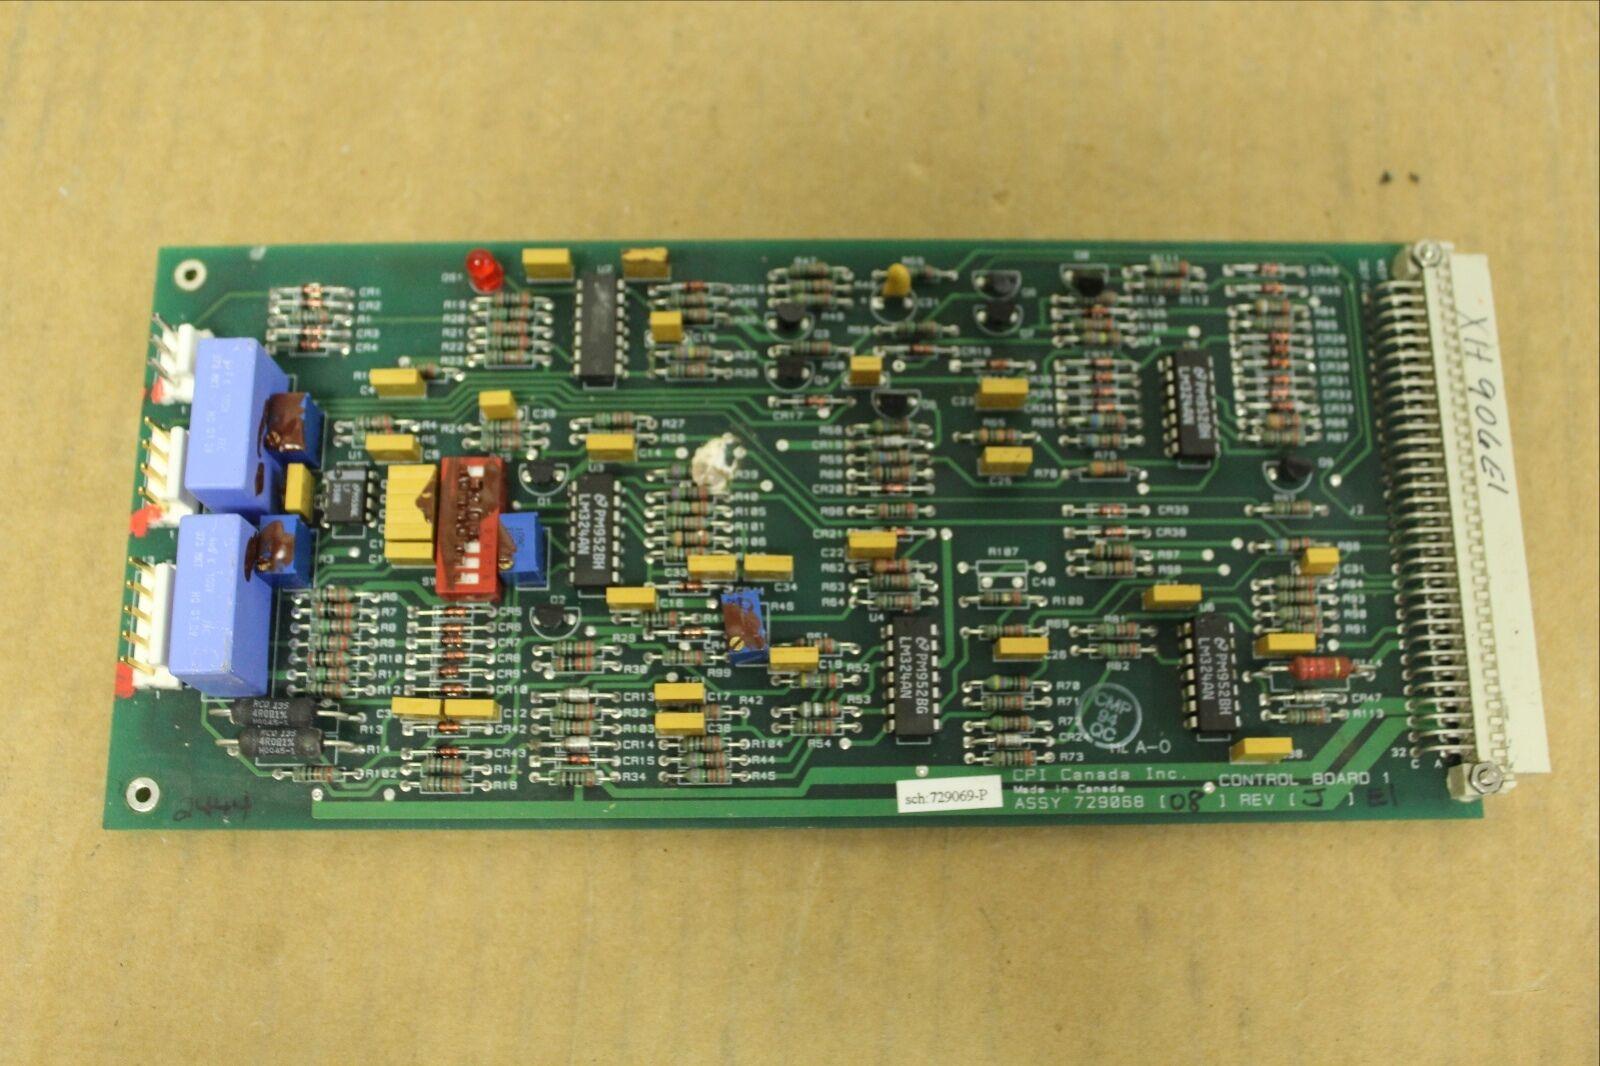 CPI CONTROL CIRCUIT BOARD CARD 729068-08 72906808 REV J